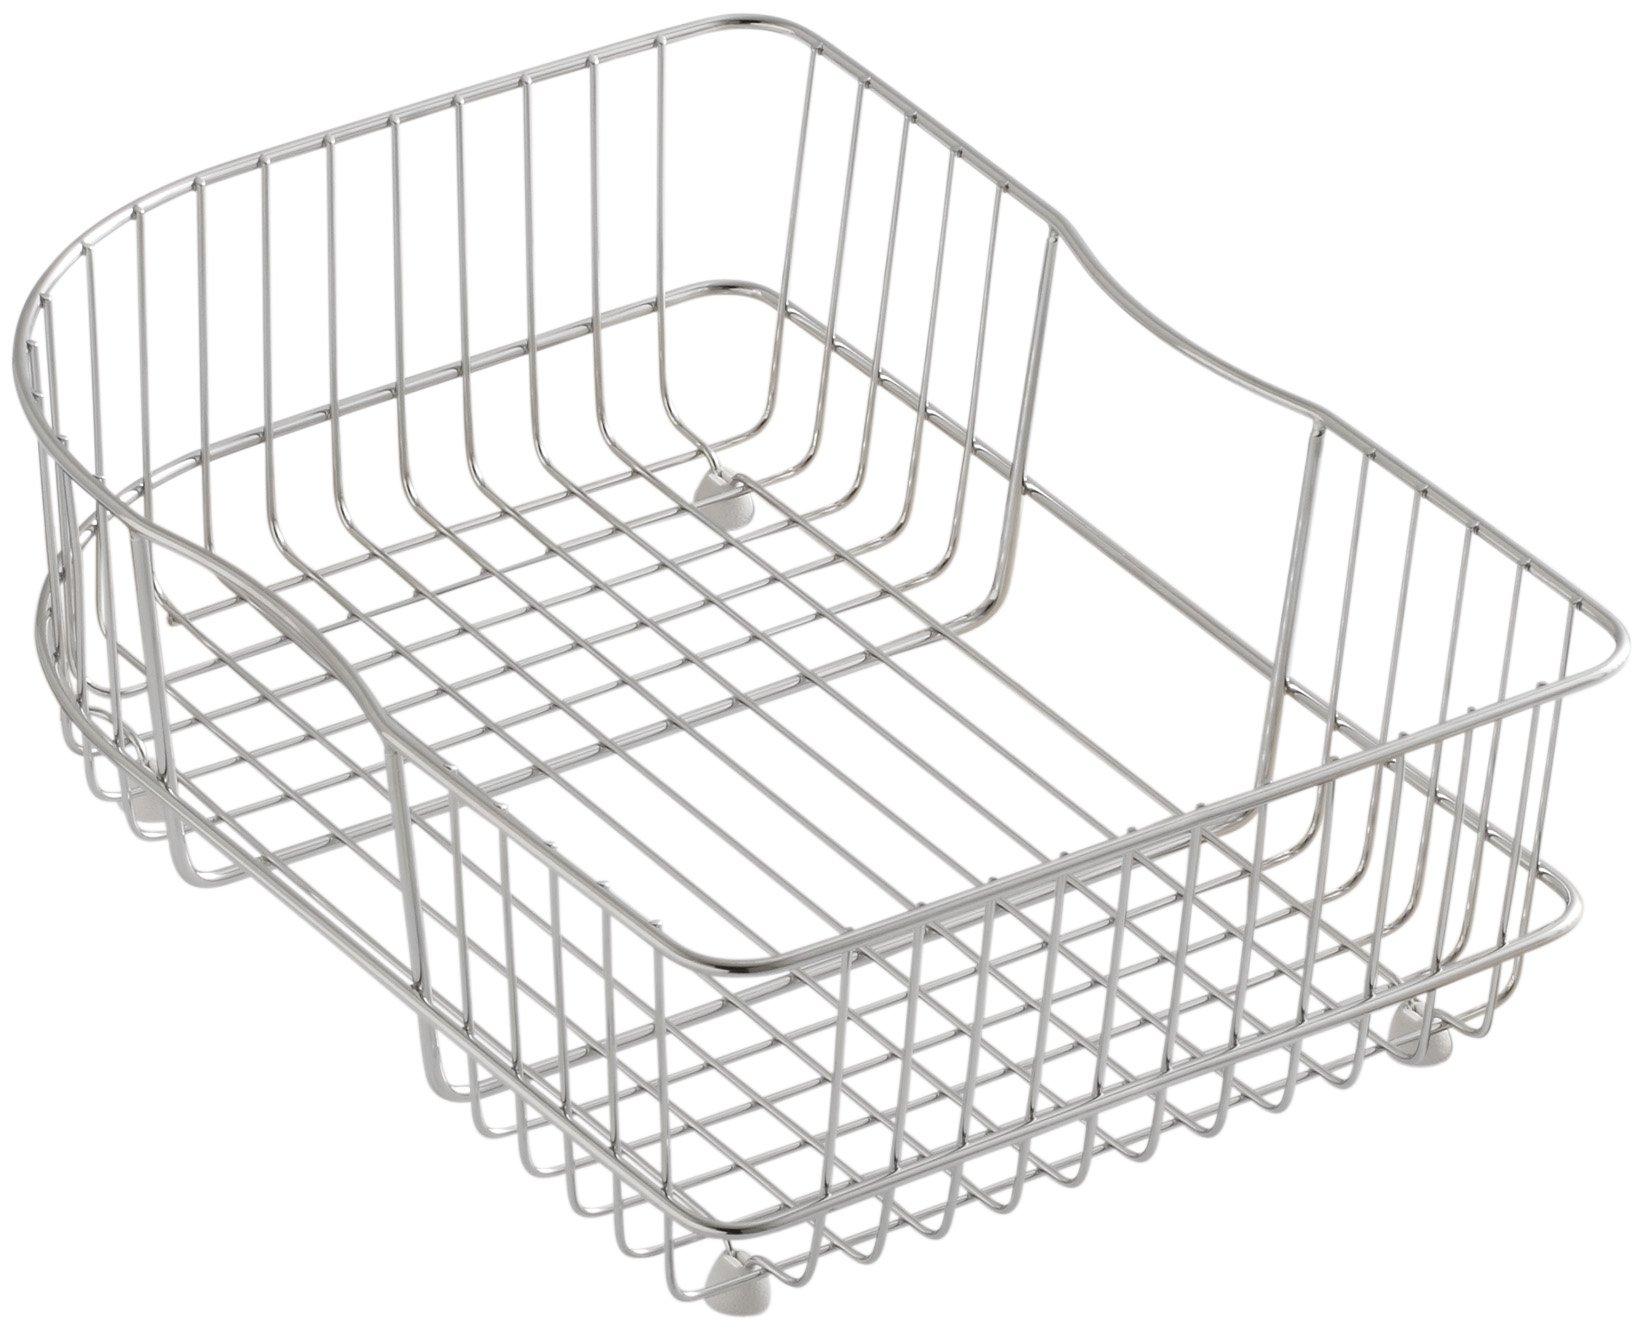 KOHLER K-6521-ST Wire Rinse Basket, Stainless Steel